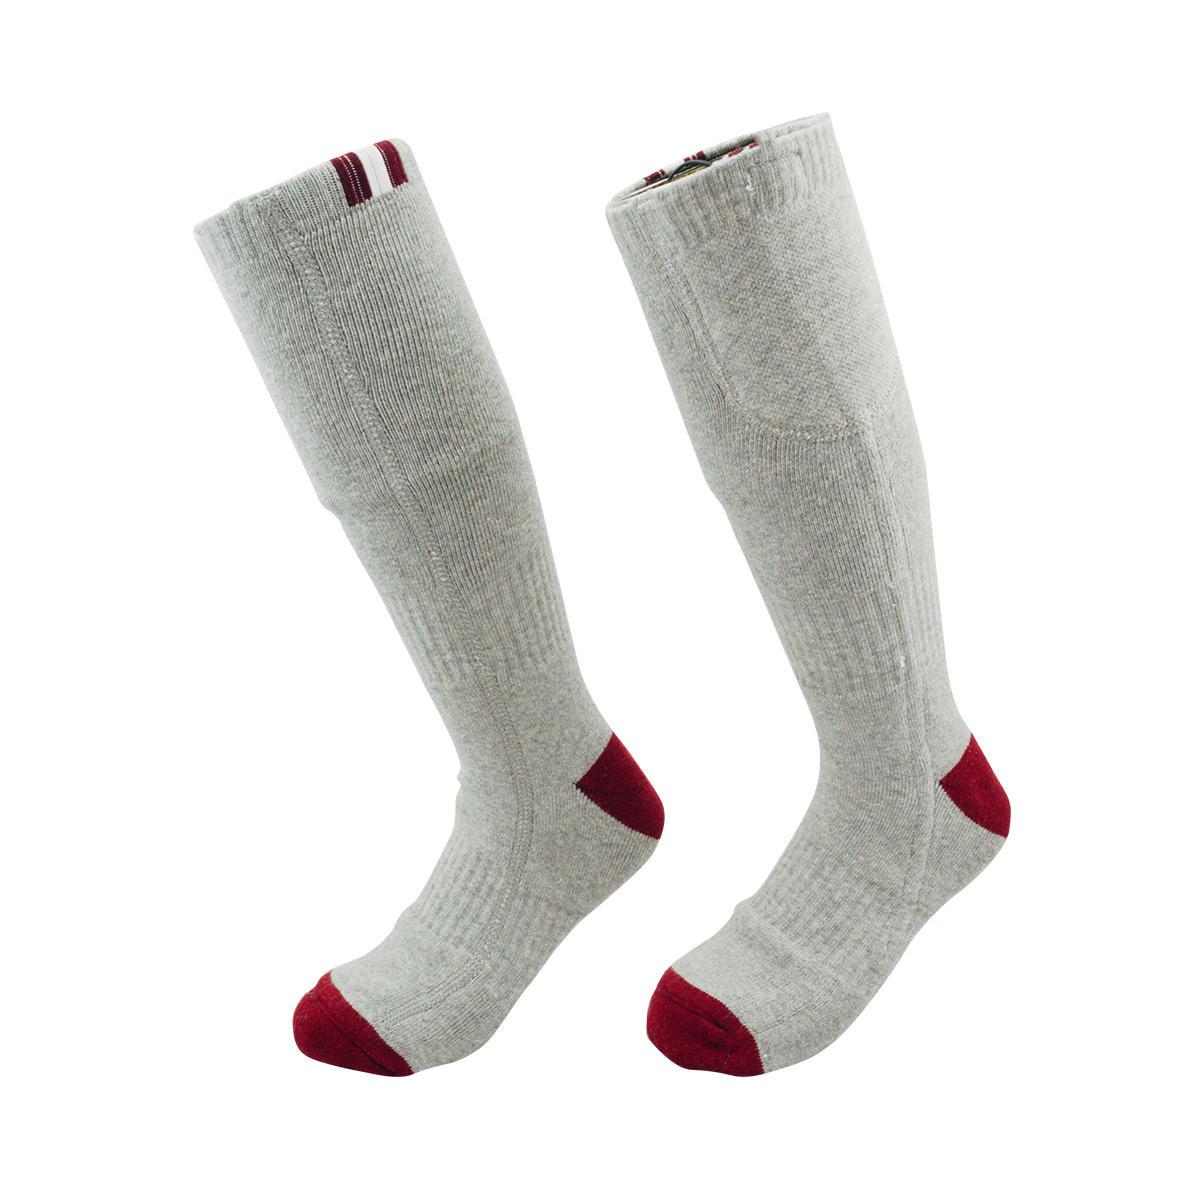 Women Men Electric Heated Socks Feet Foot Winter Warmer, Banggood  - buy with discount